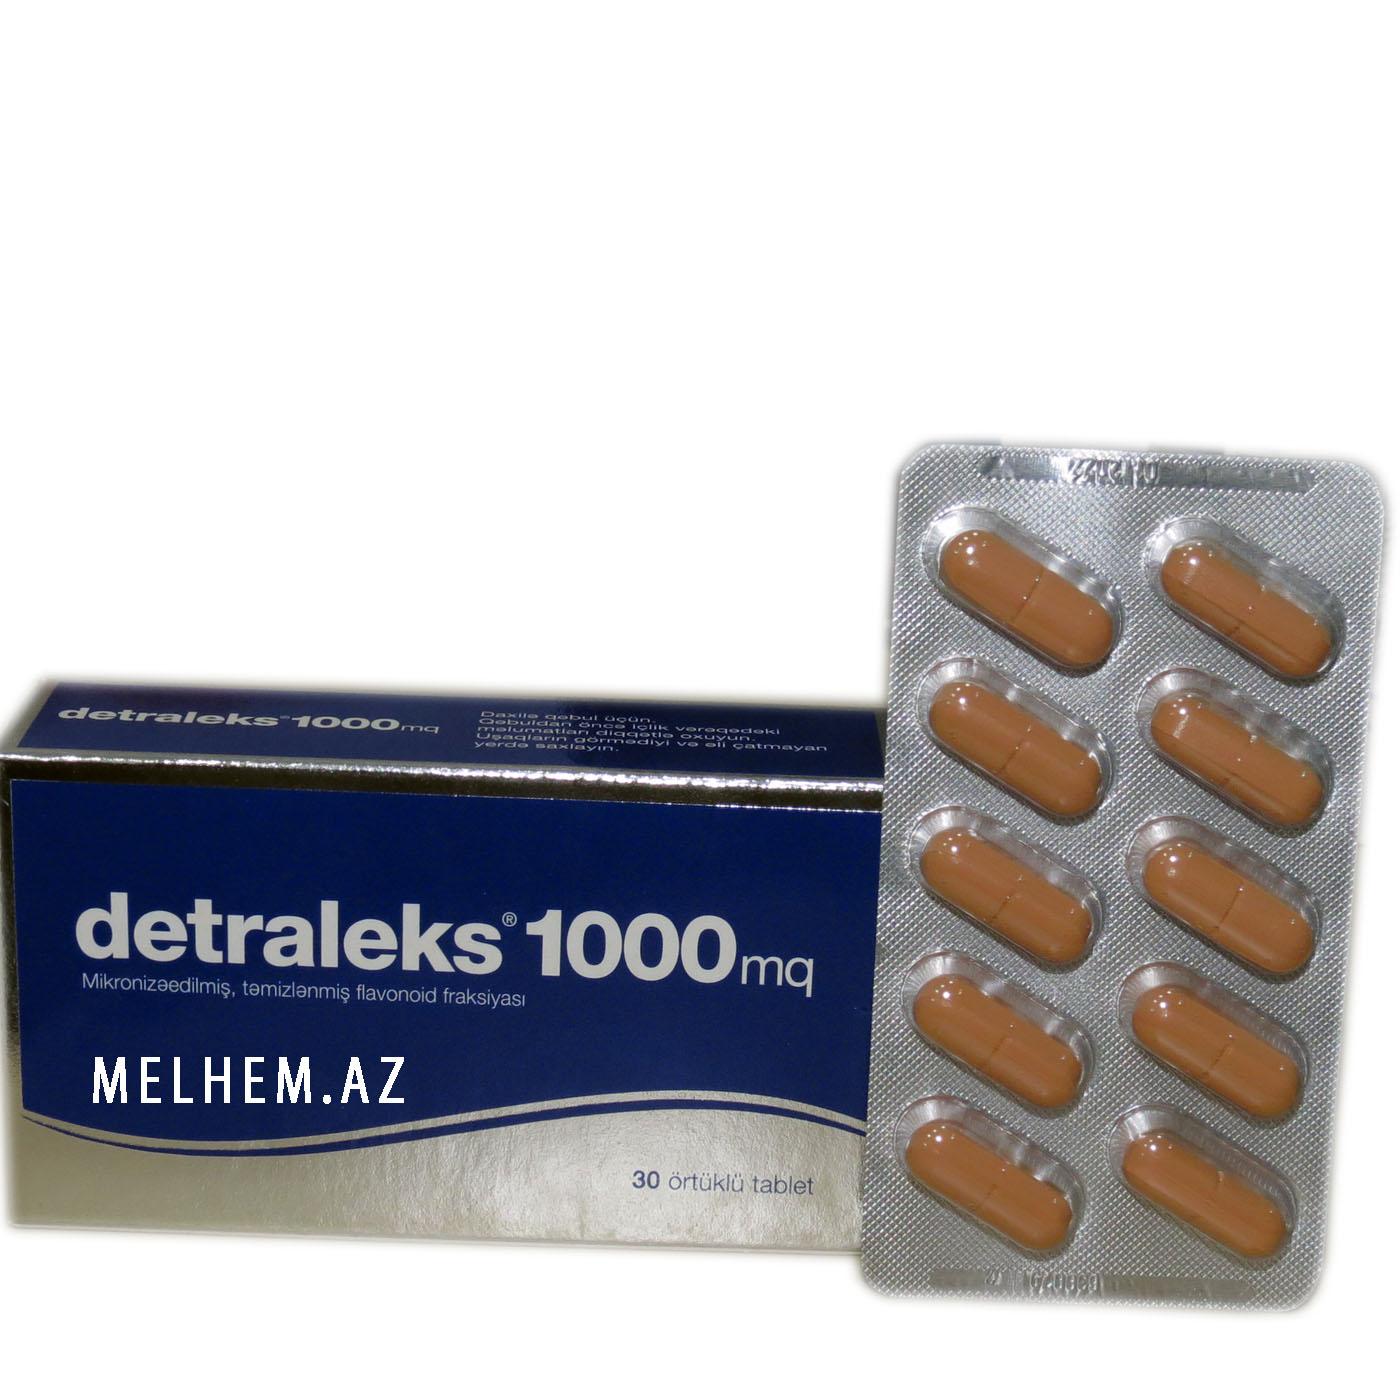 DETRALEKS 1000 MQ